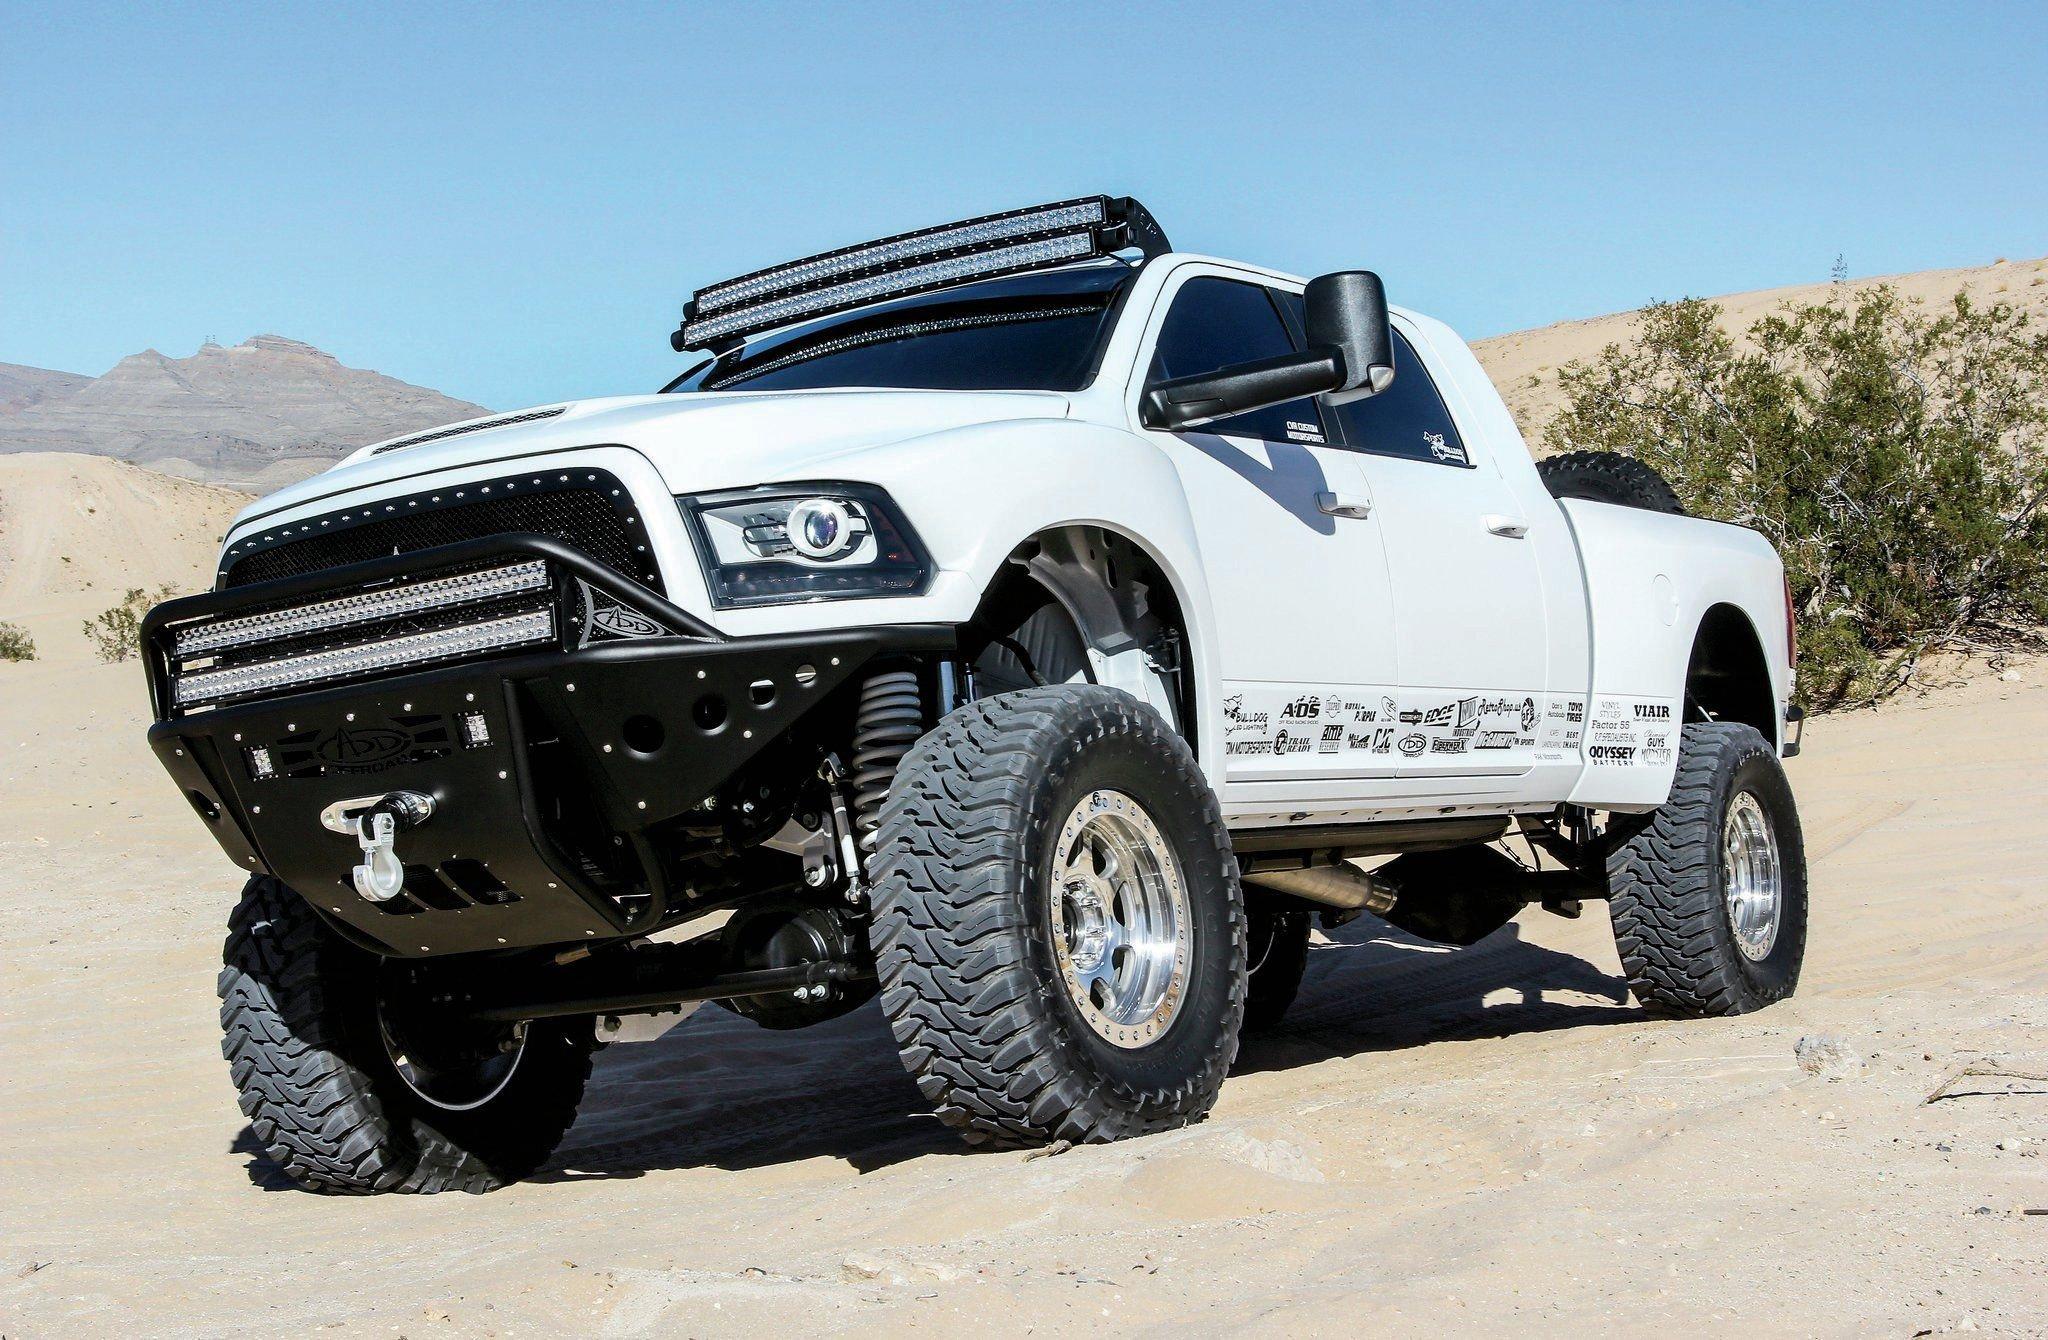 2013 dodge ram 3500 mega cab 4x4 pickup custom tuning wallpaper 2048x1340 859761 wallpaperup - Dodge Truck 2015 Custom